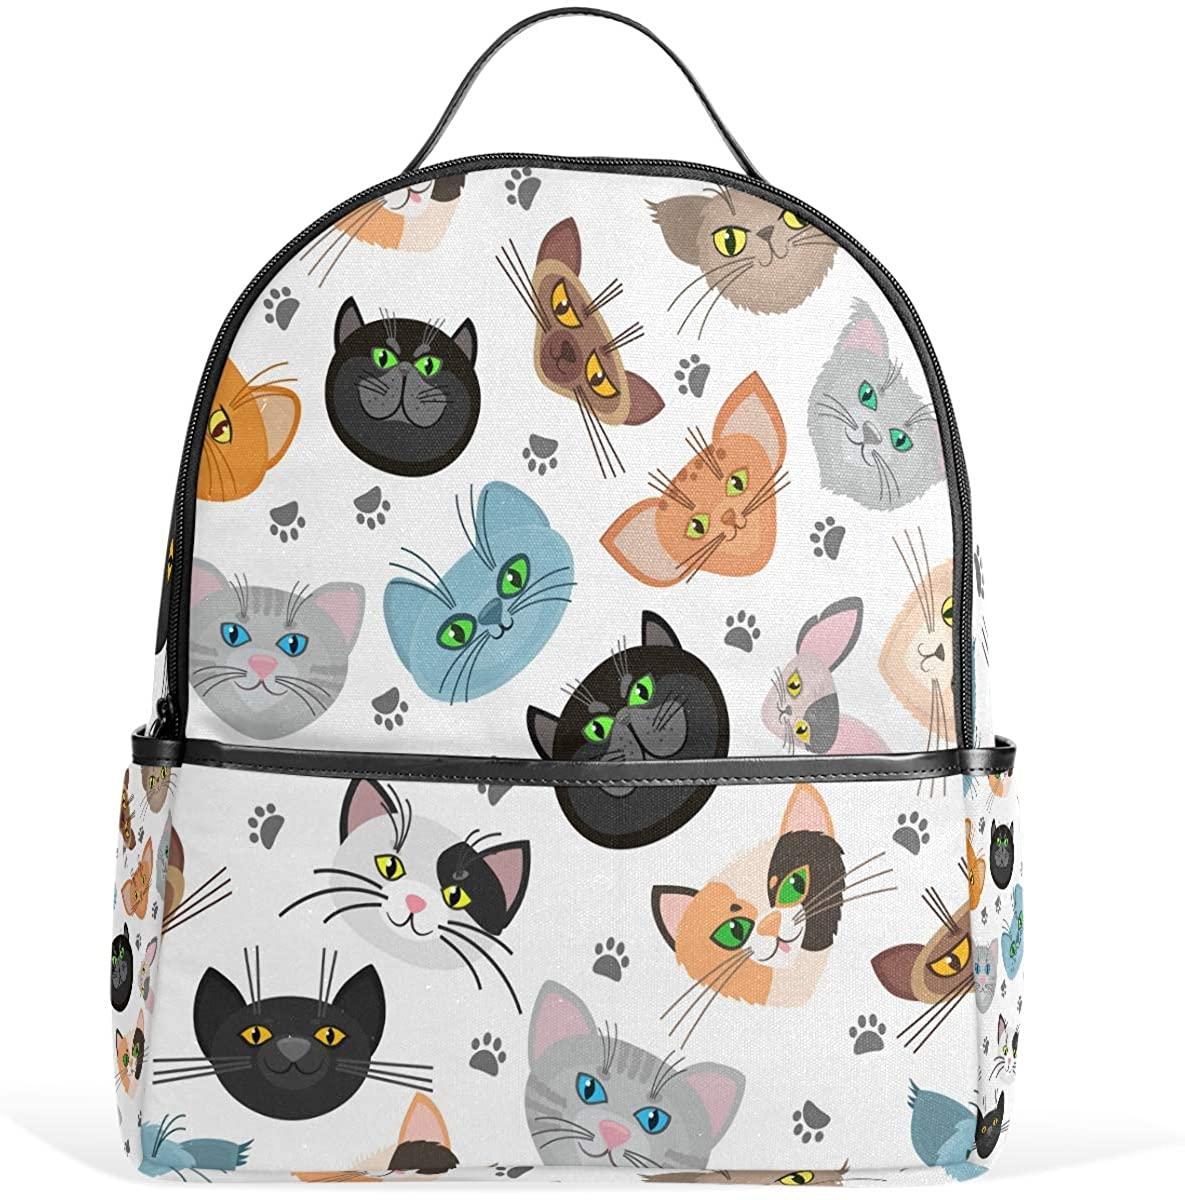 Olinyou Colorful Cute Cat Paw Cartoon Animal Kitten Foot Backpack School Book Bag Daypacks Shoulder Bags Rucksack for Boys Girls Students